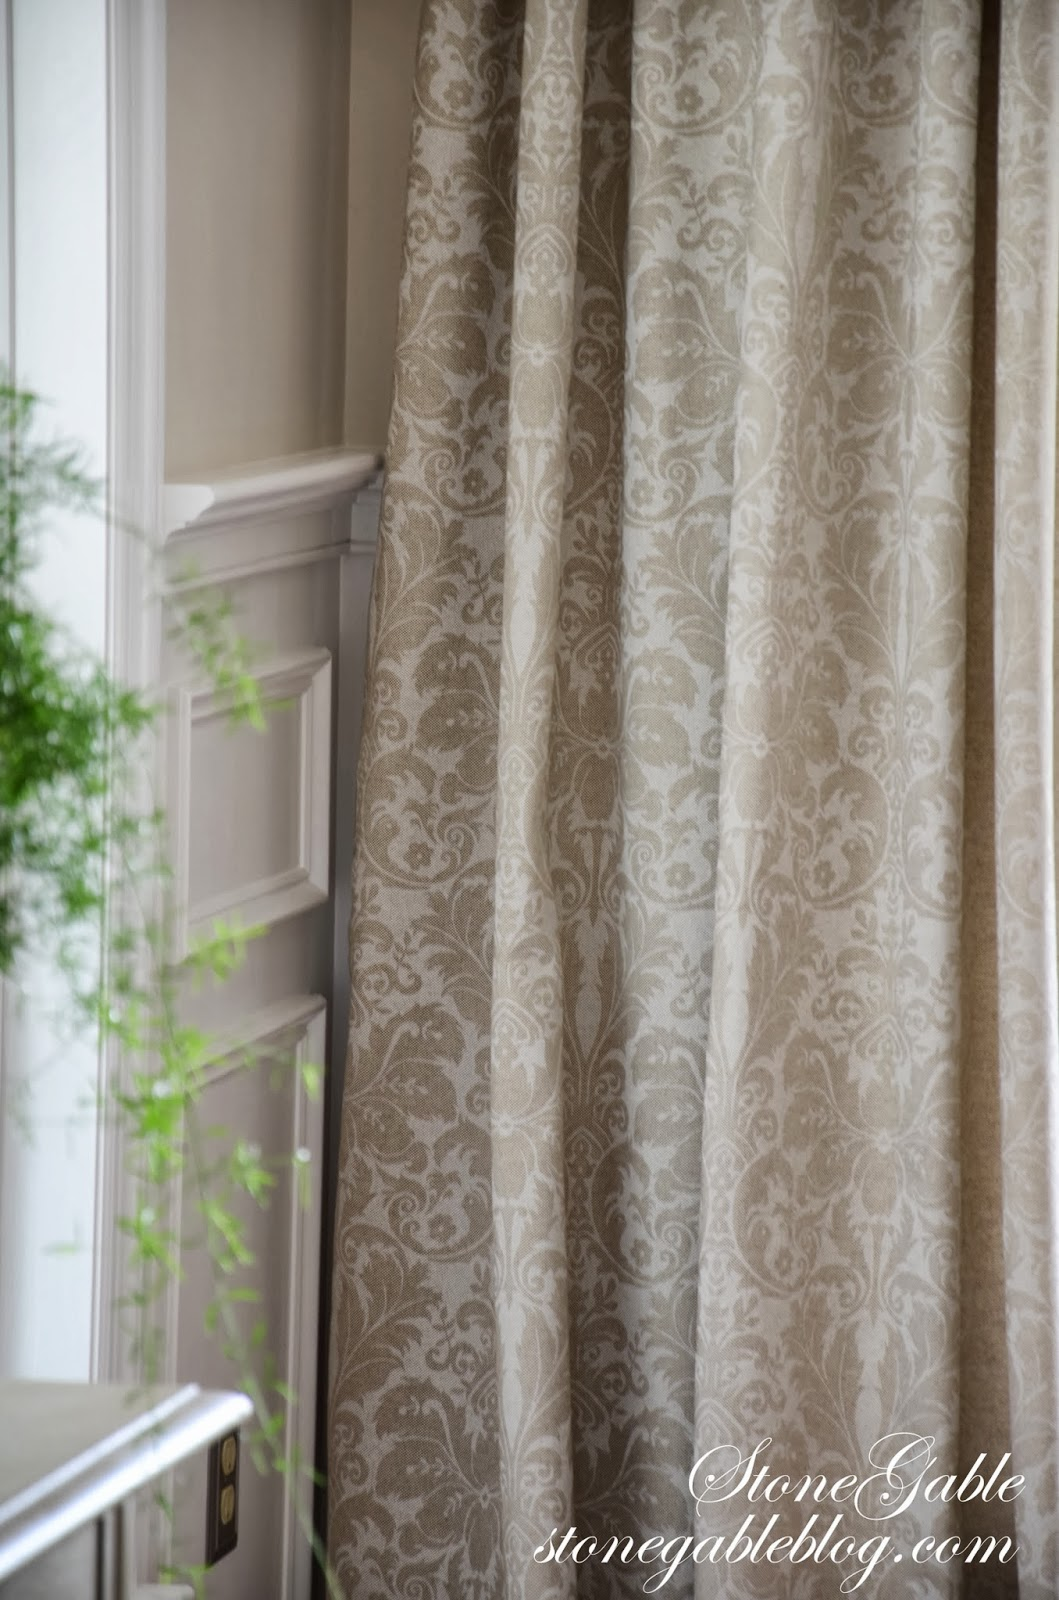 Dining room curtains interior design ideas for your - Dining room curtain ideas ...